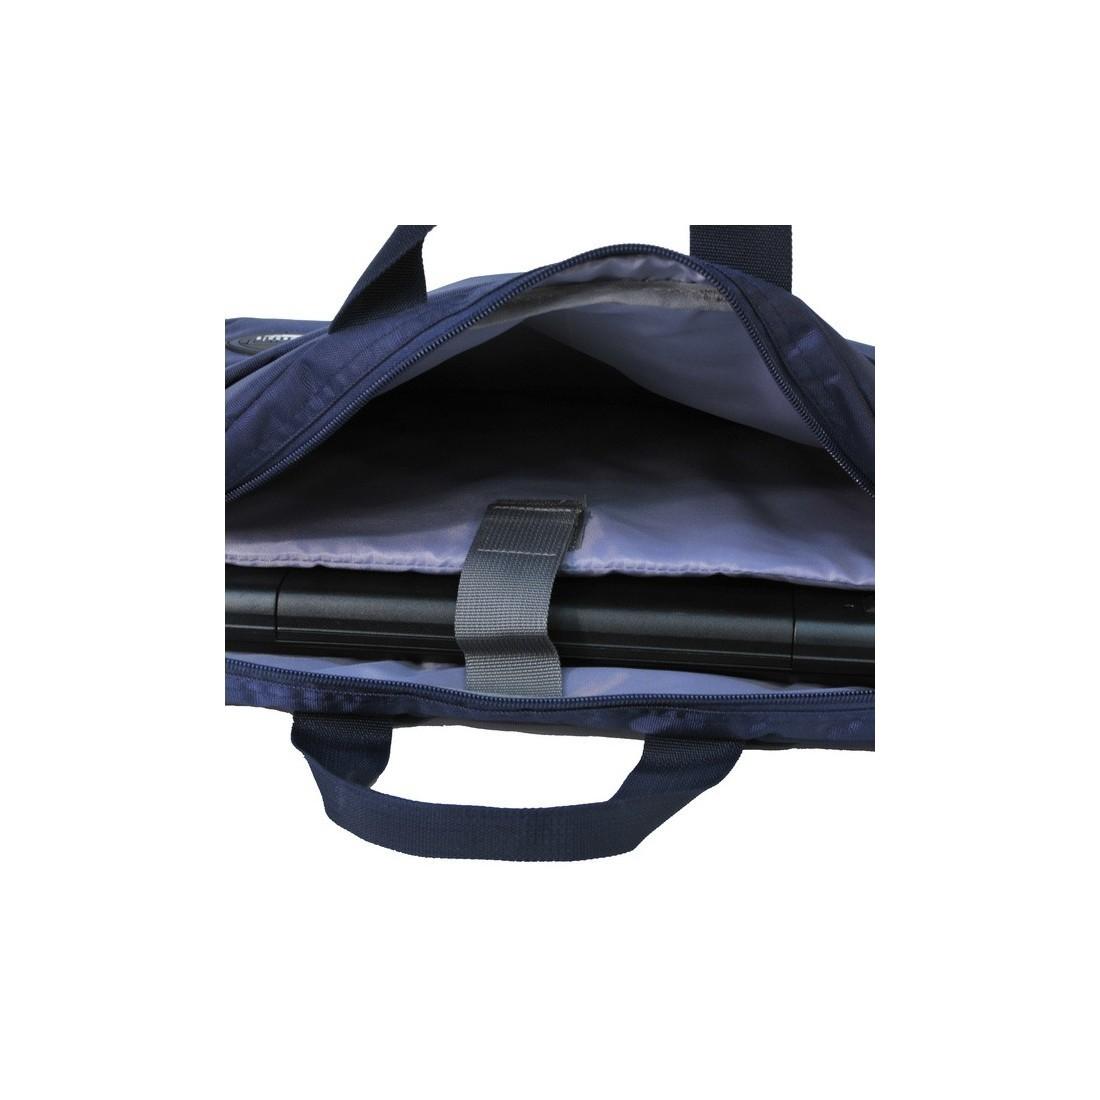 Torba na laptop granatowa - plecak-tornister.pl